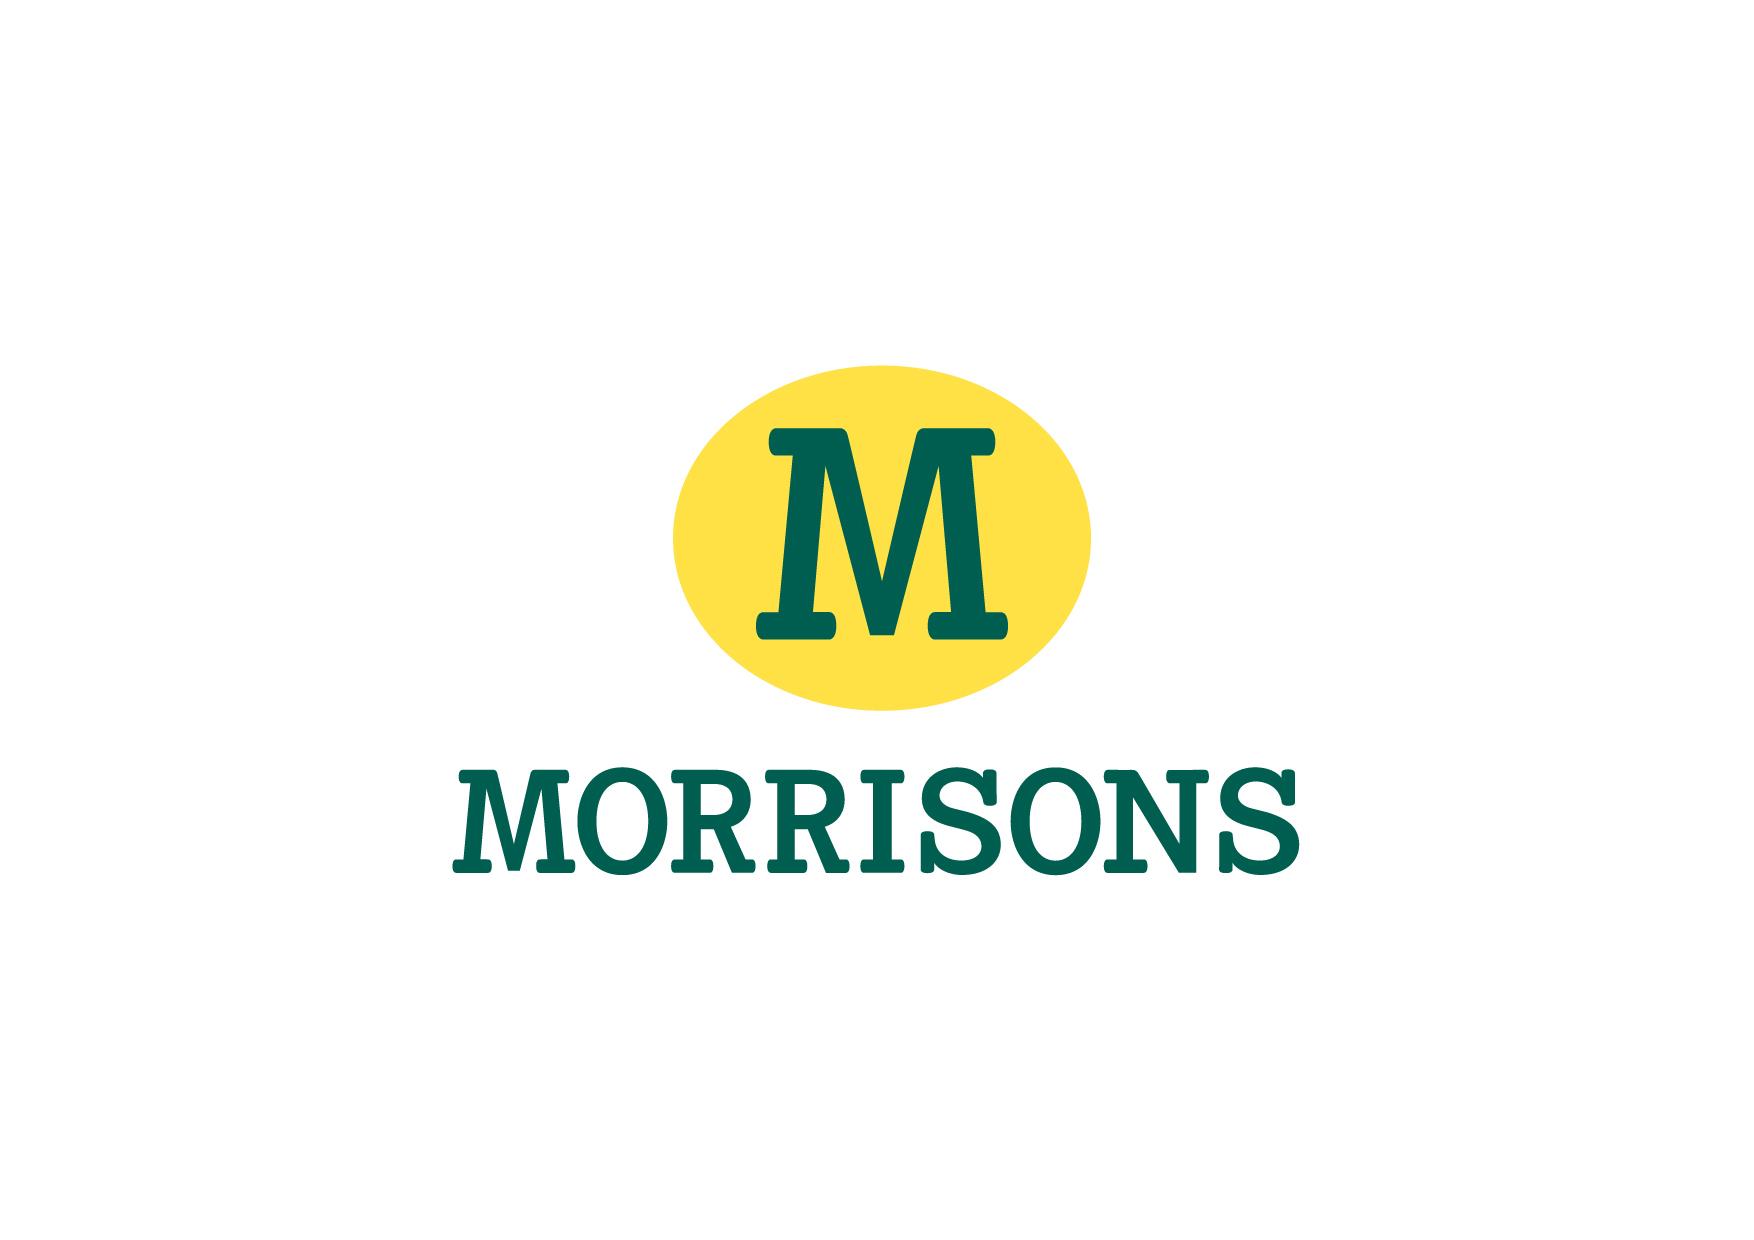 wm-morrison-supermarkets-plc-mrw-receives-sell-rating-from-deutsche-bank-ag.jpg